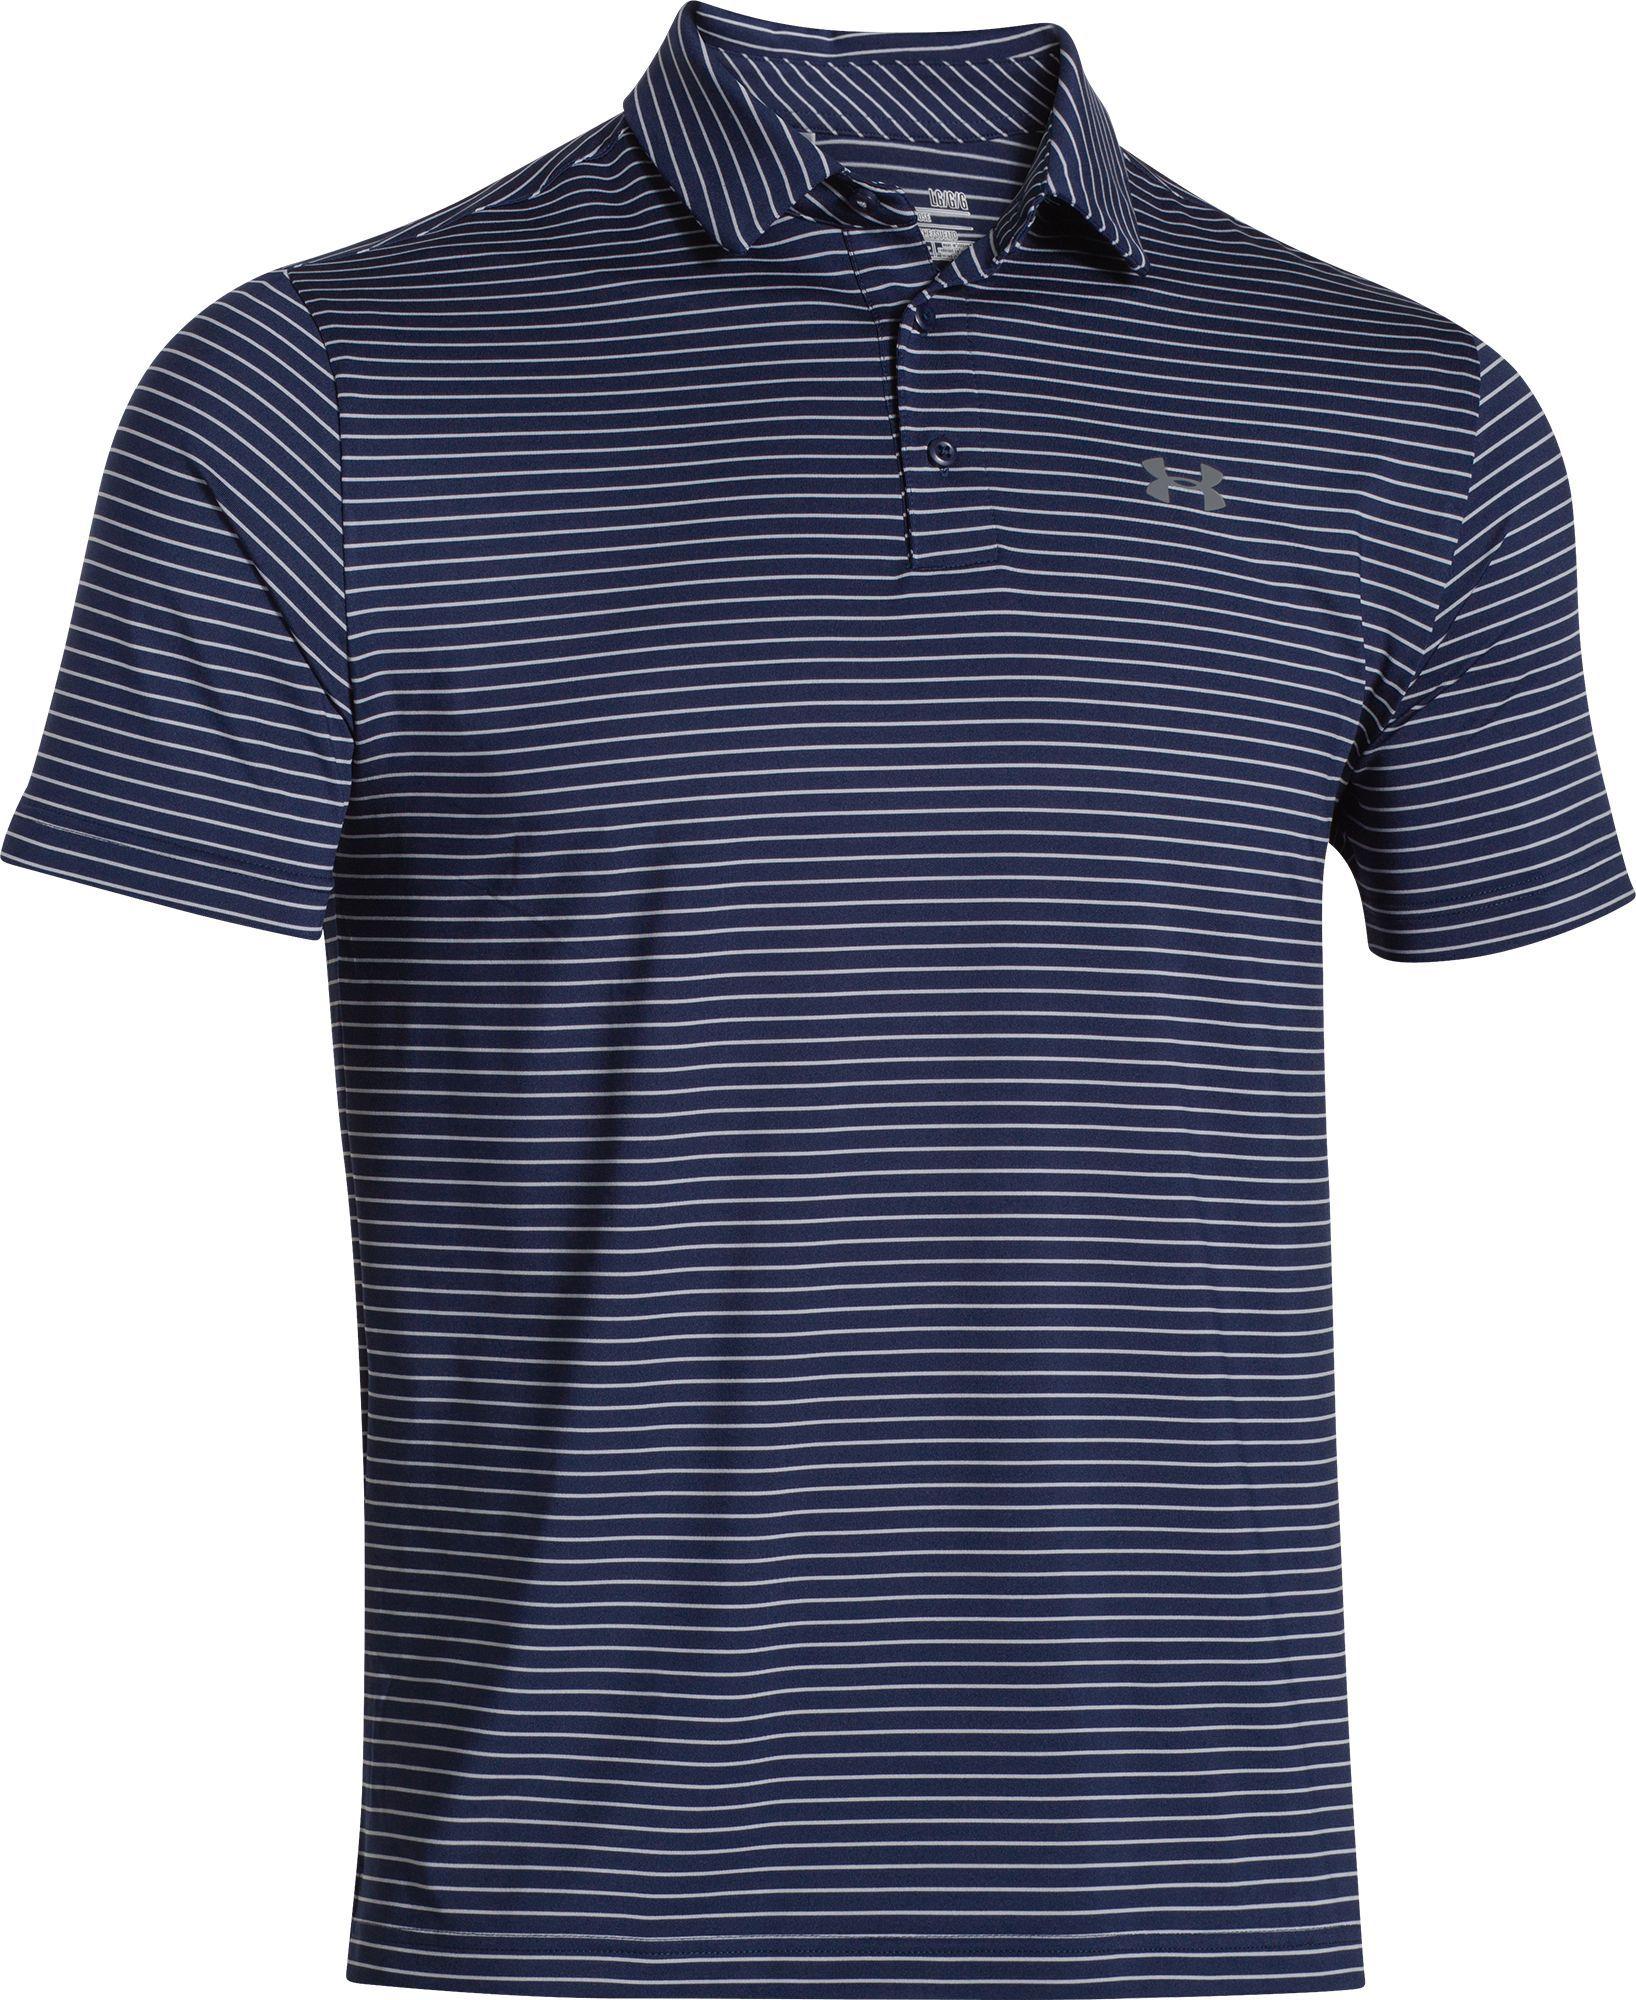 871021c9 Under Armour Men's Playoff Heather Stripe Golf Polo, Size: Medium, Academy